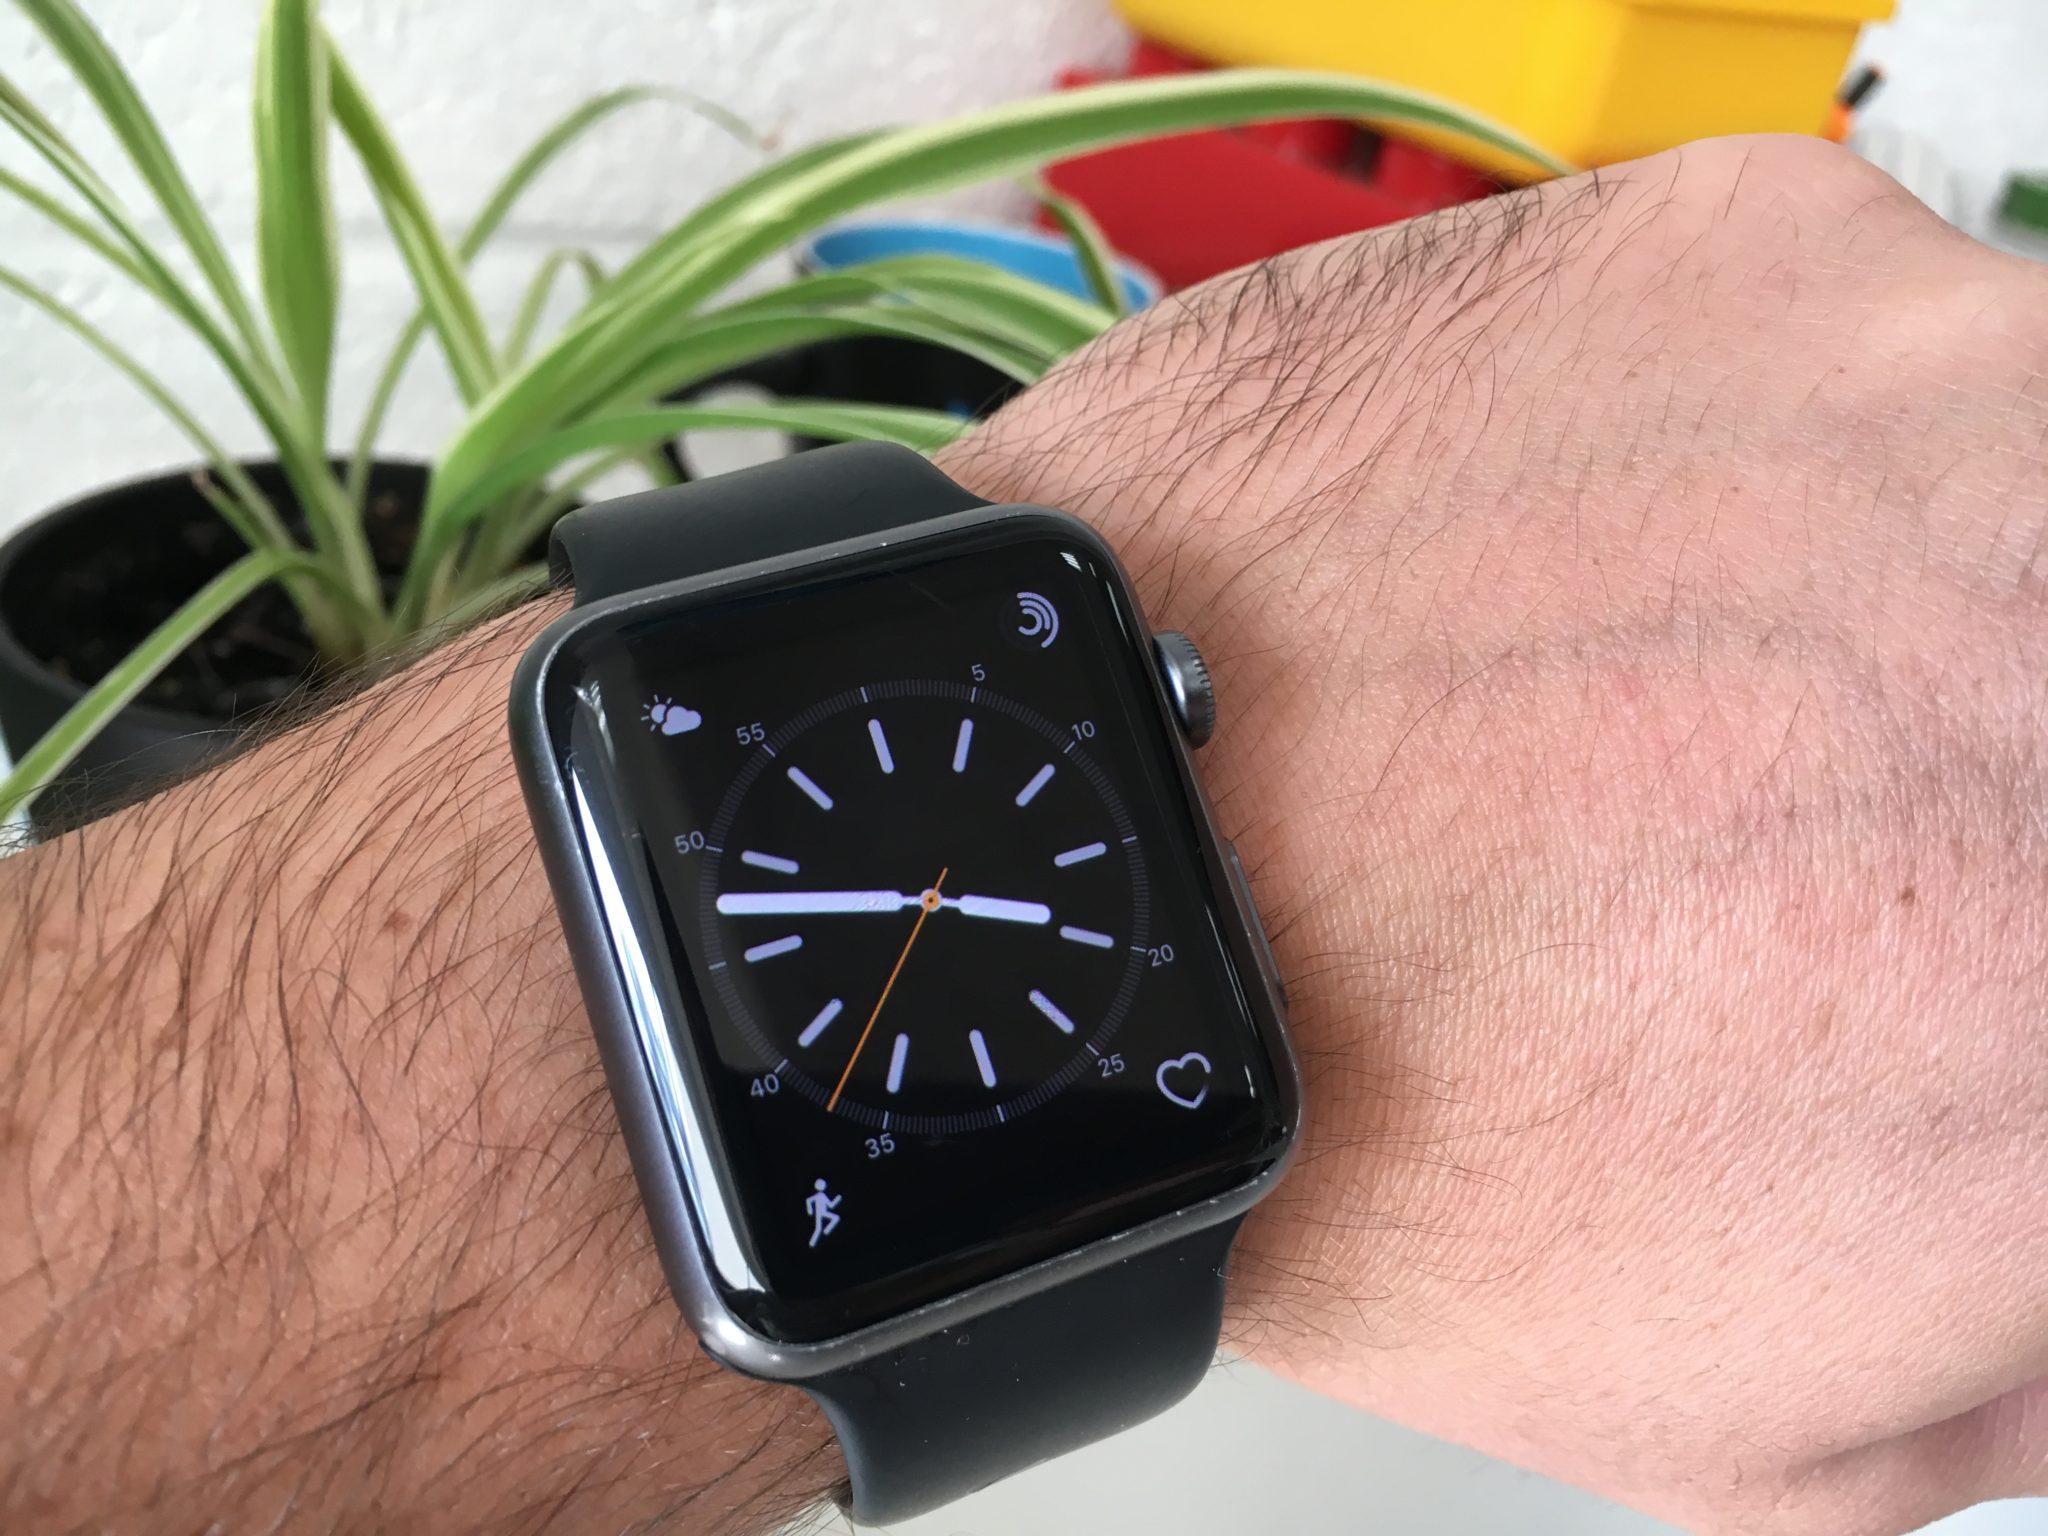 a-quoi-sert-apple-watch-savinien.fr_-1040×7802